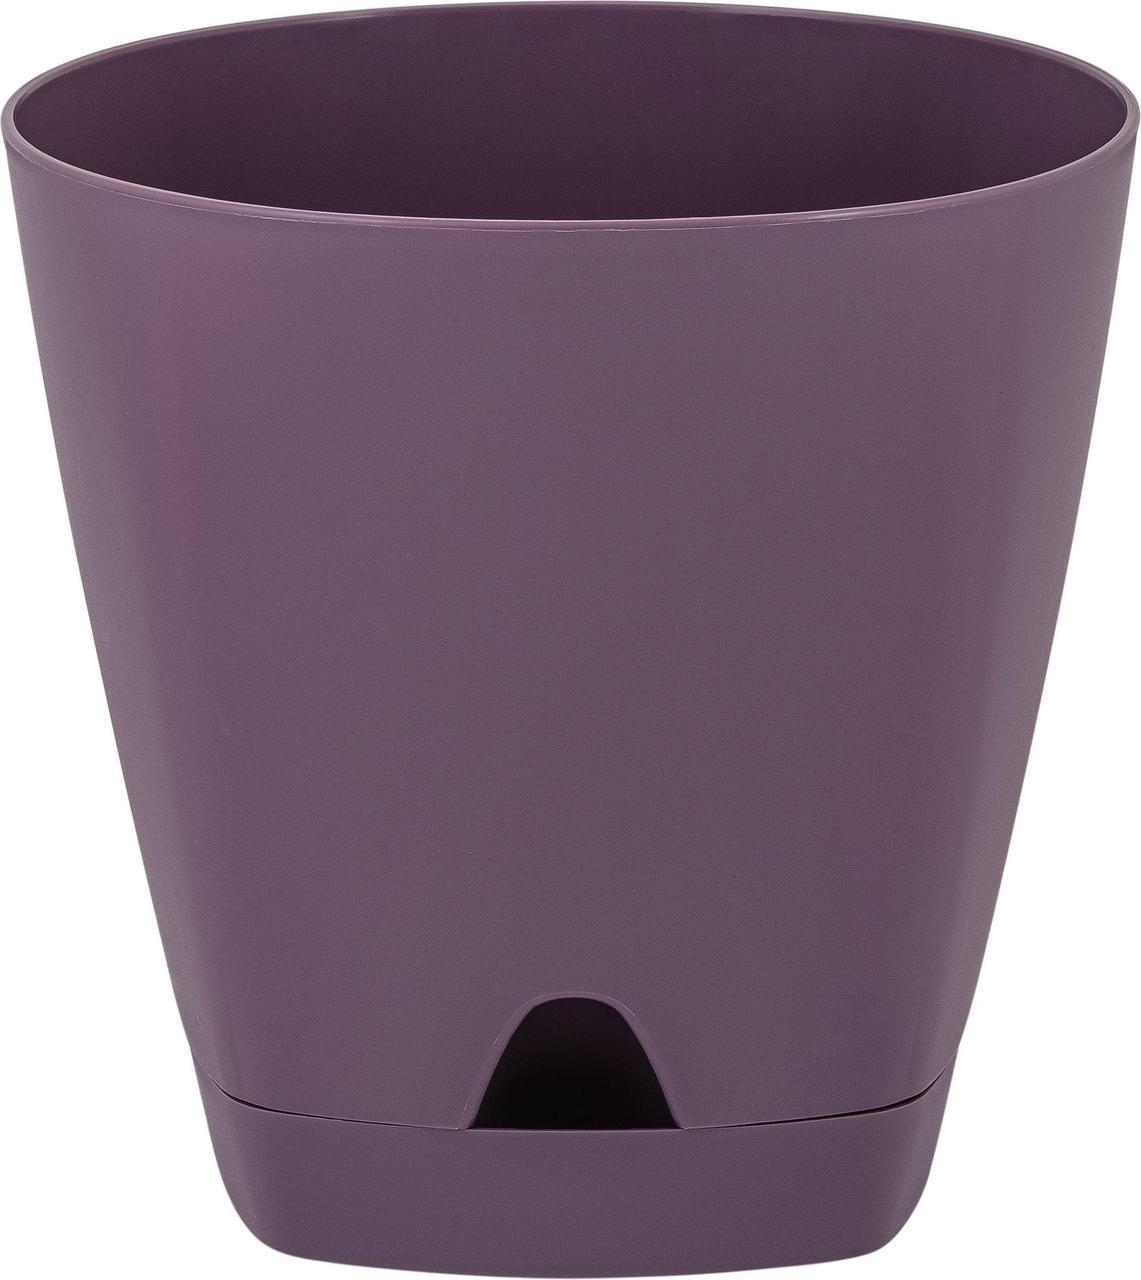 Горшок для цветов AMSTERDAM D 170 mm/2,5l с прикорневым поливом Морозная слива